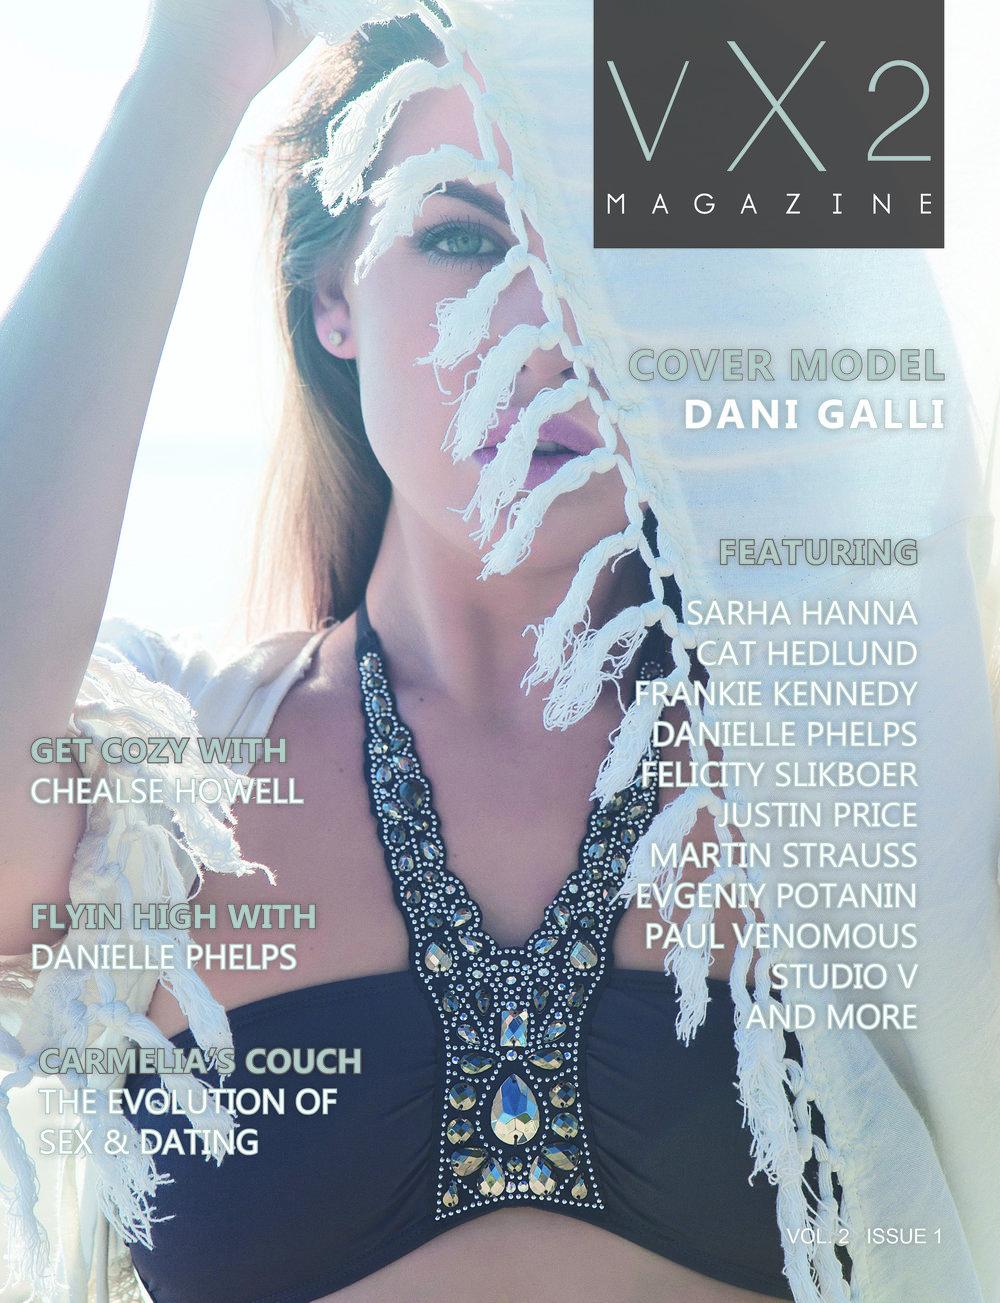 VX2 Magazine Vol. 2 Issue 1